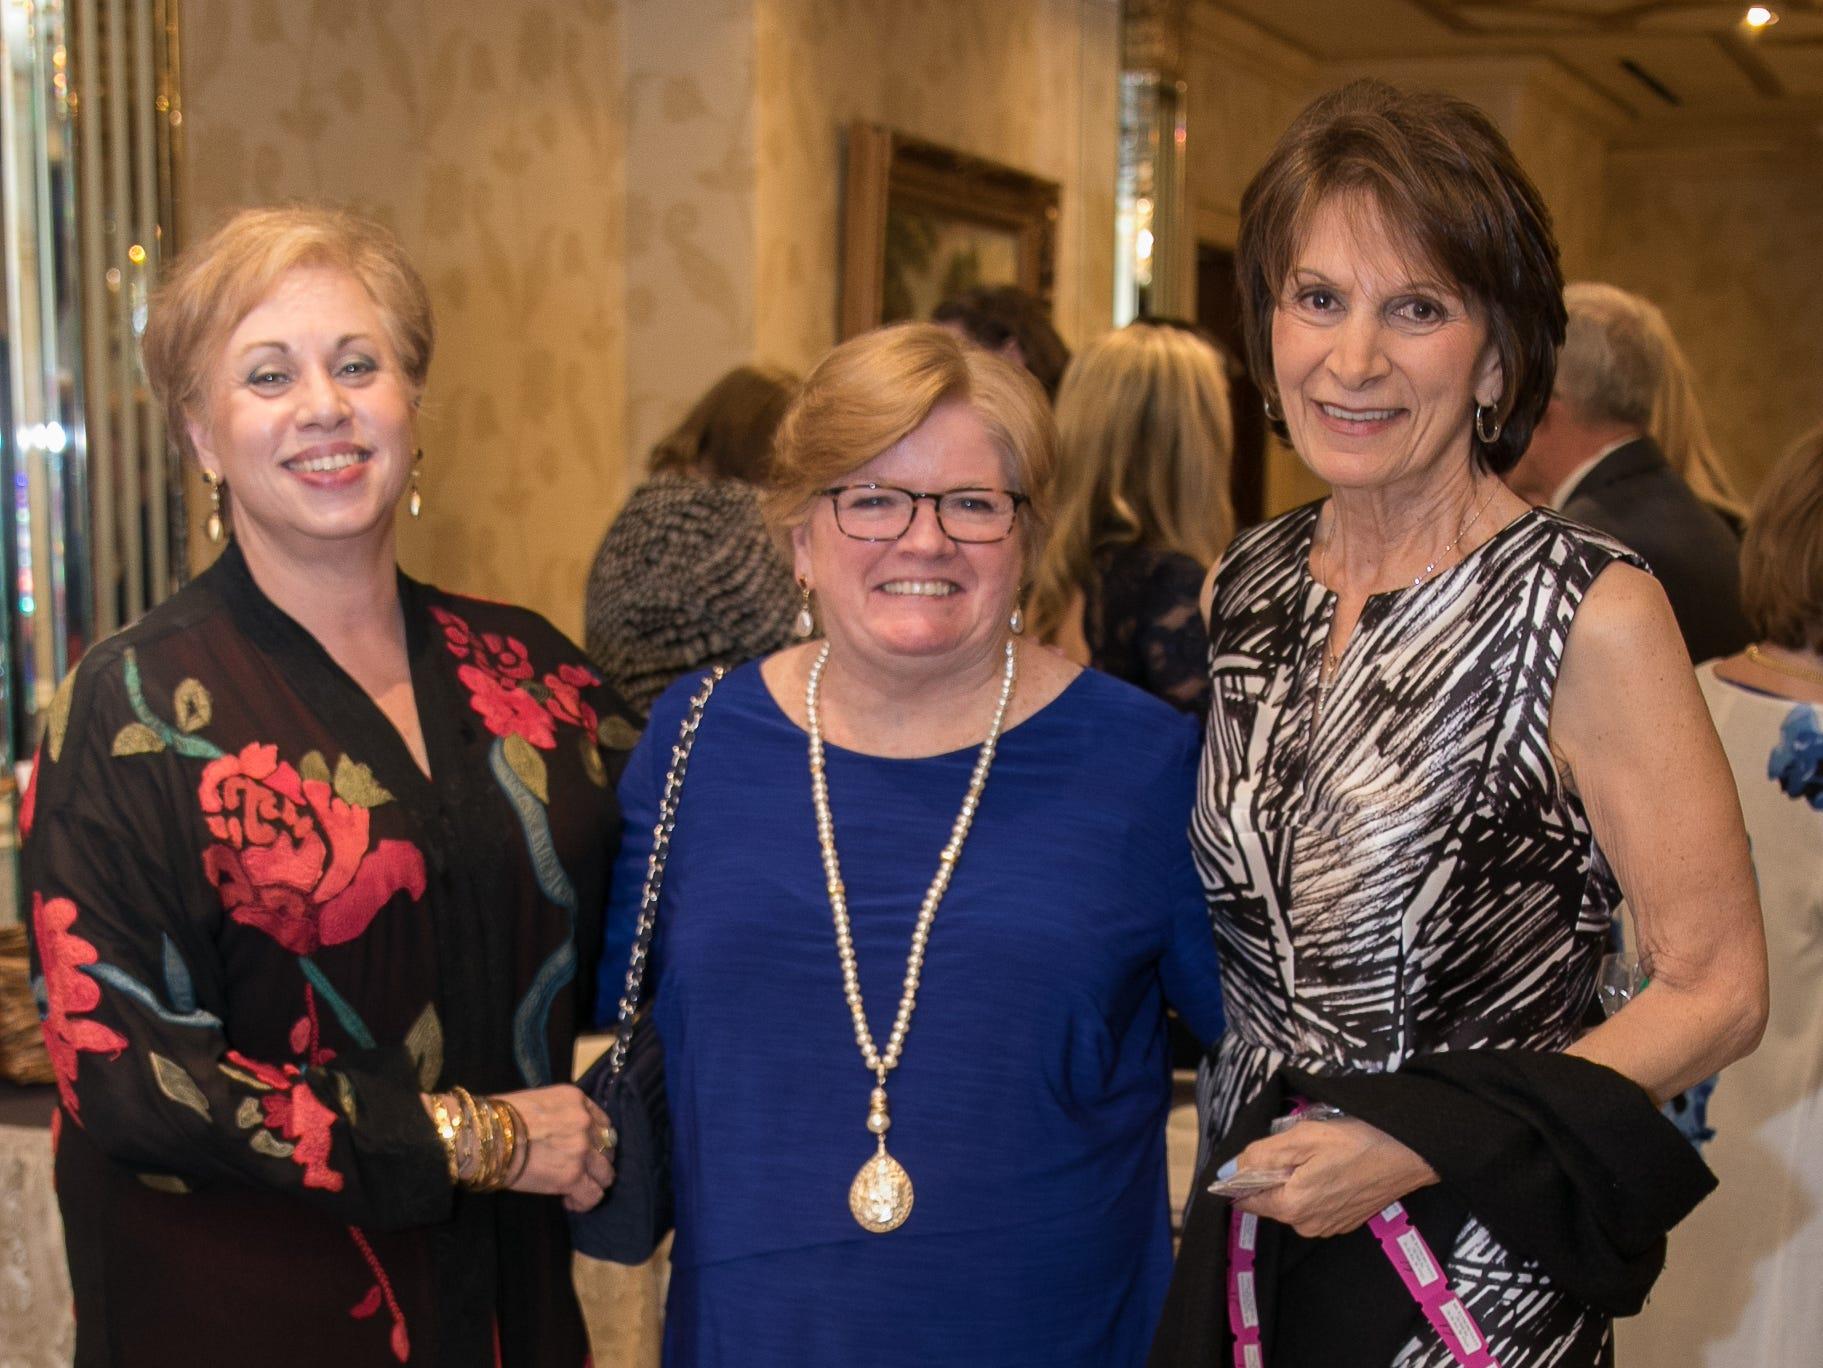 Louise Ryan, Pat McHugh, Joan Saud. New Hope, a Pregnancy Resource Center, held their annual gala at Seasons in Washington Township. 04/05/2019